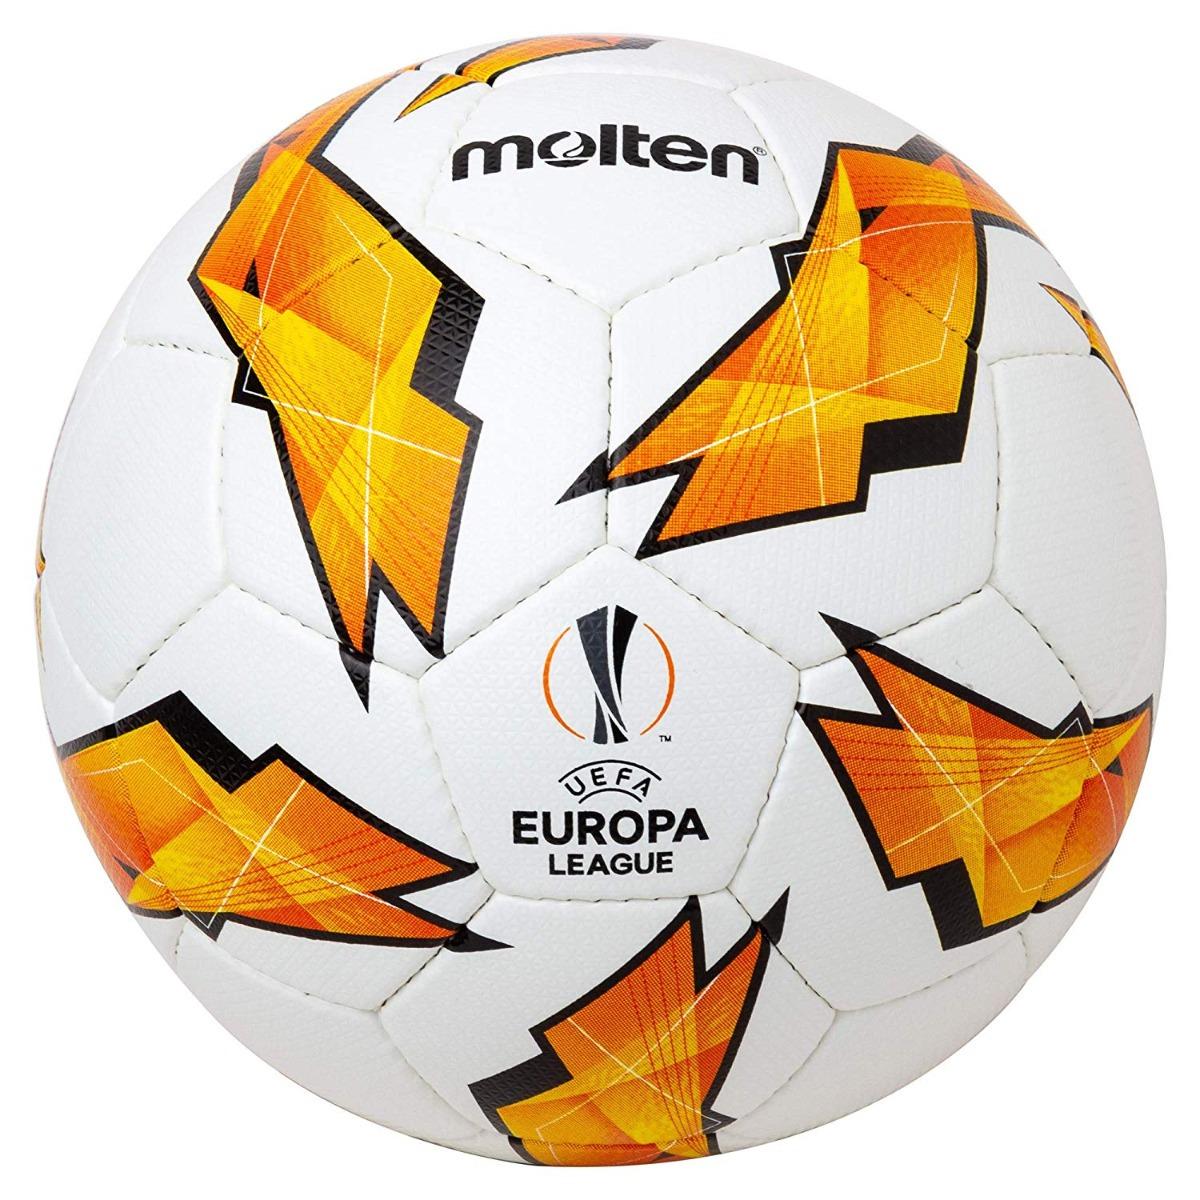 Balones Futbol Molten Uefa Europa League Blanco Mod 2810 N.4 ... f56d7240a7768